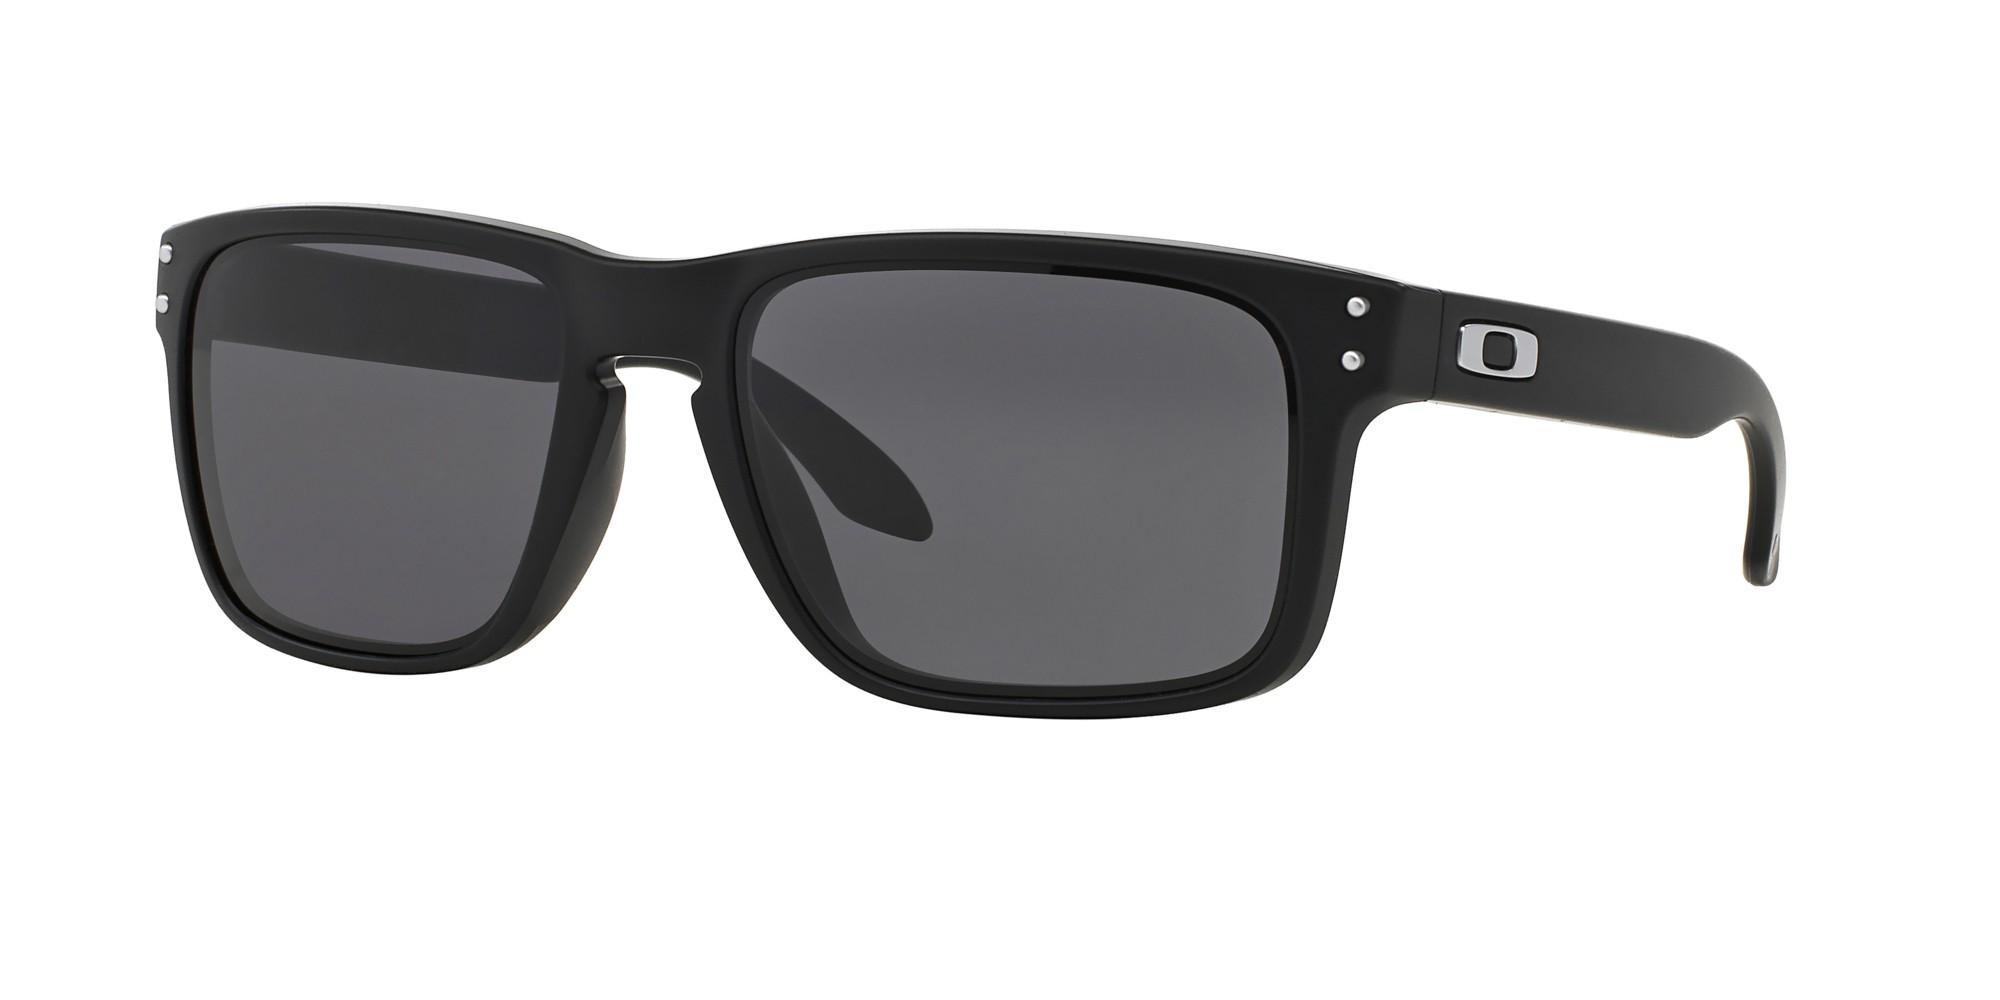 468dab88453 Oakley Holbrook Prescription Sunglasses